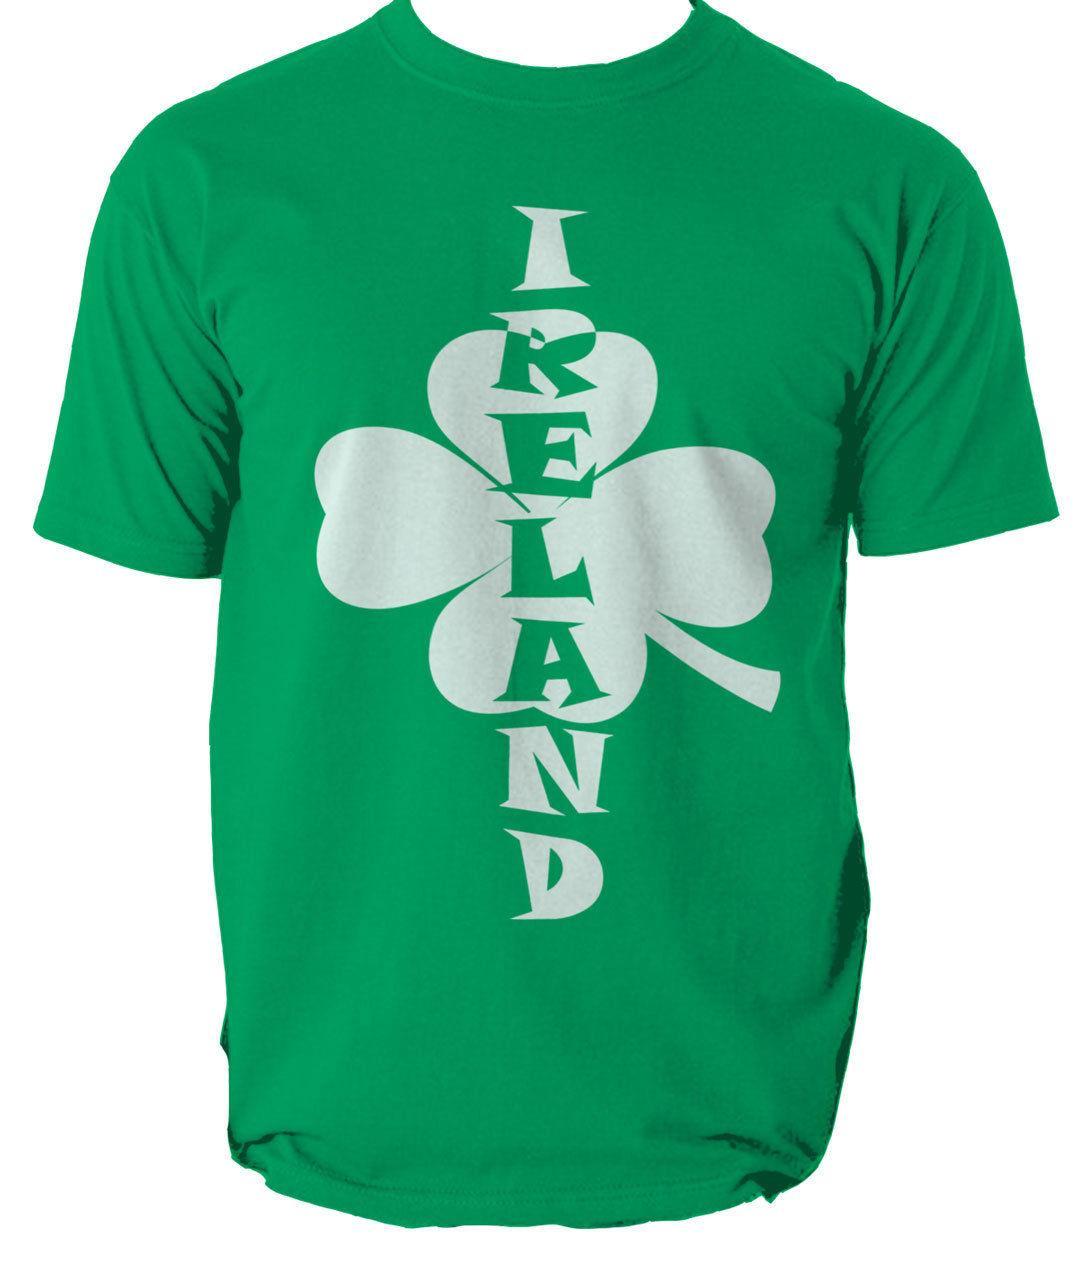 Ireland Printed T-Shirt St Patricks Day Paddys Irish Mens Girls Tee Top New Size